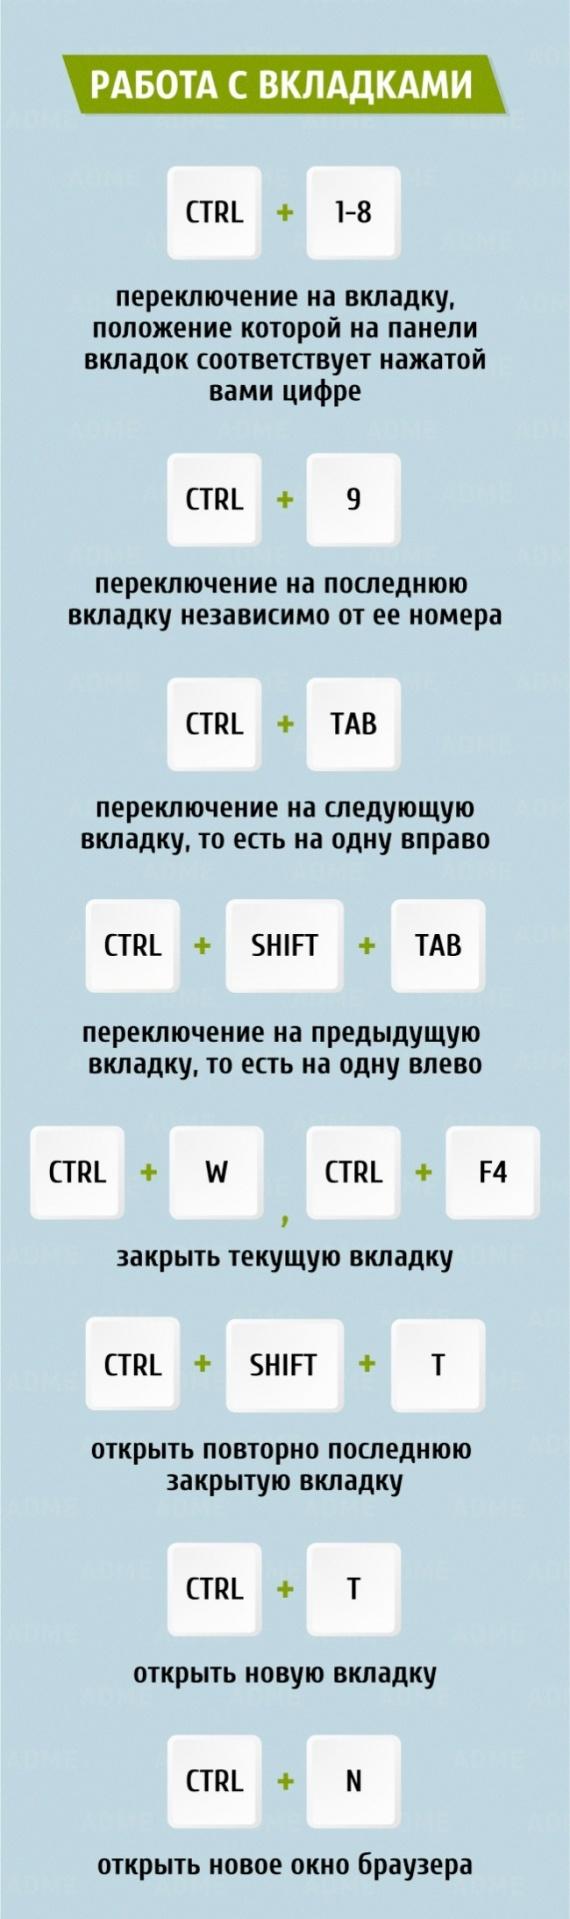 Технологии: 38 комбинаций